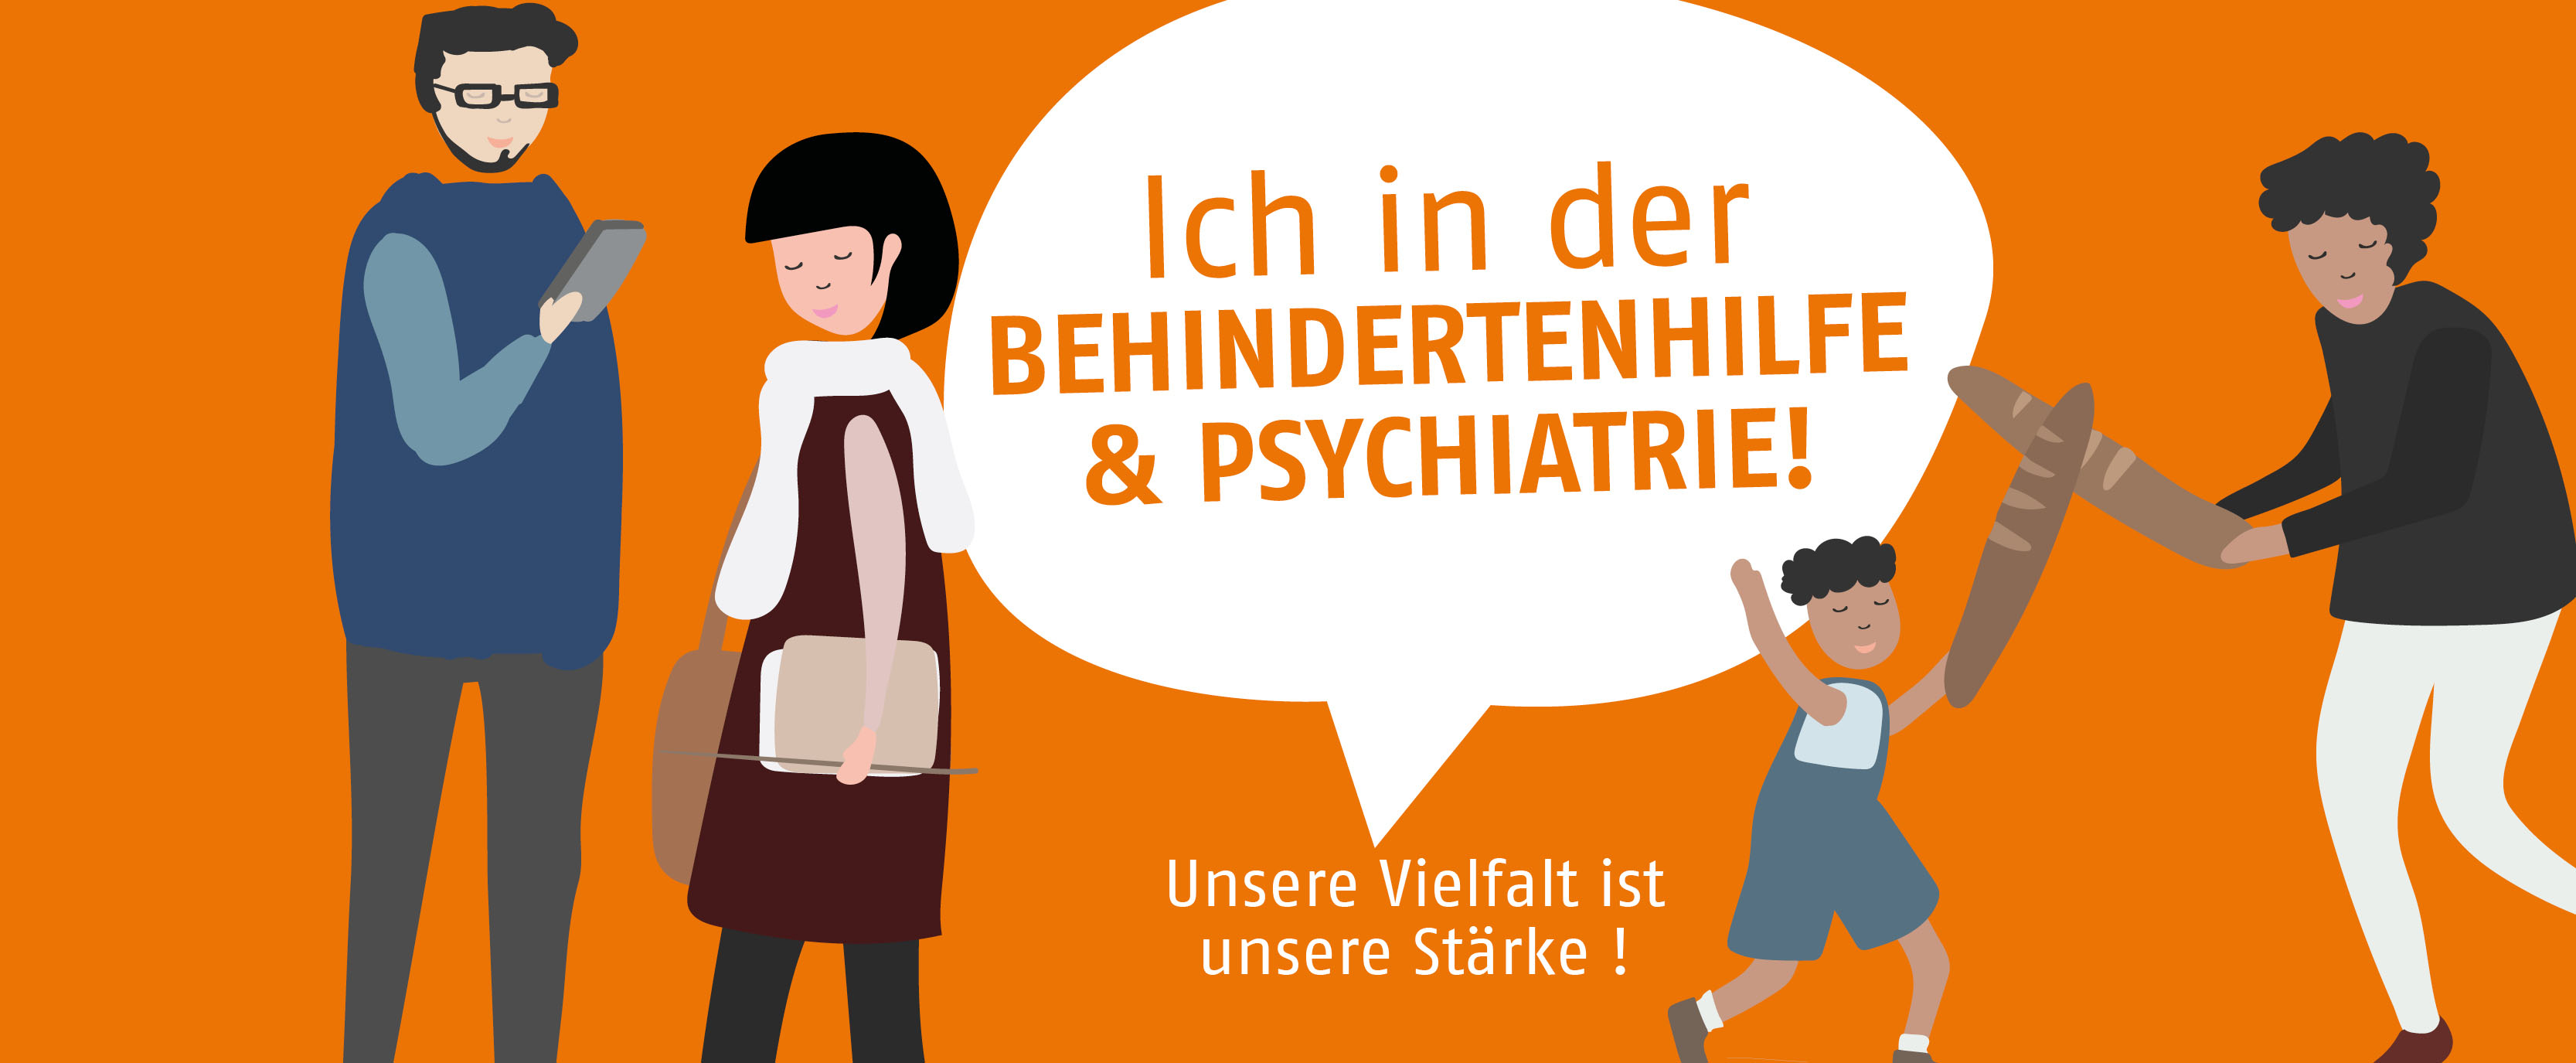 AWO Bezirksverband Ober- & Mittelfranken e. V. - Behindertenhilfe & Psychatrie